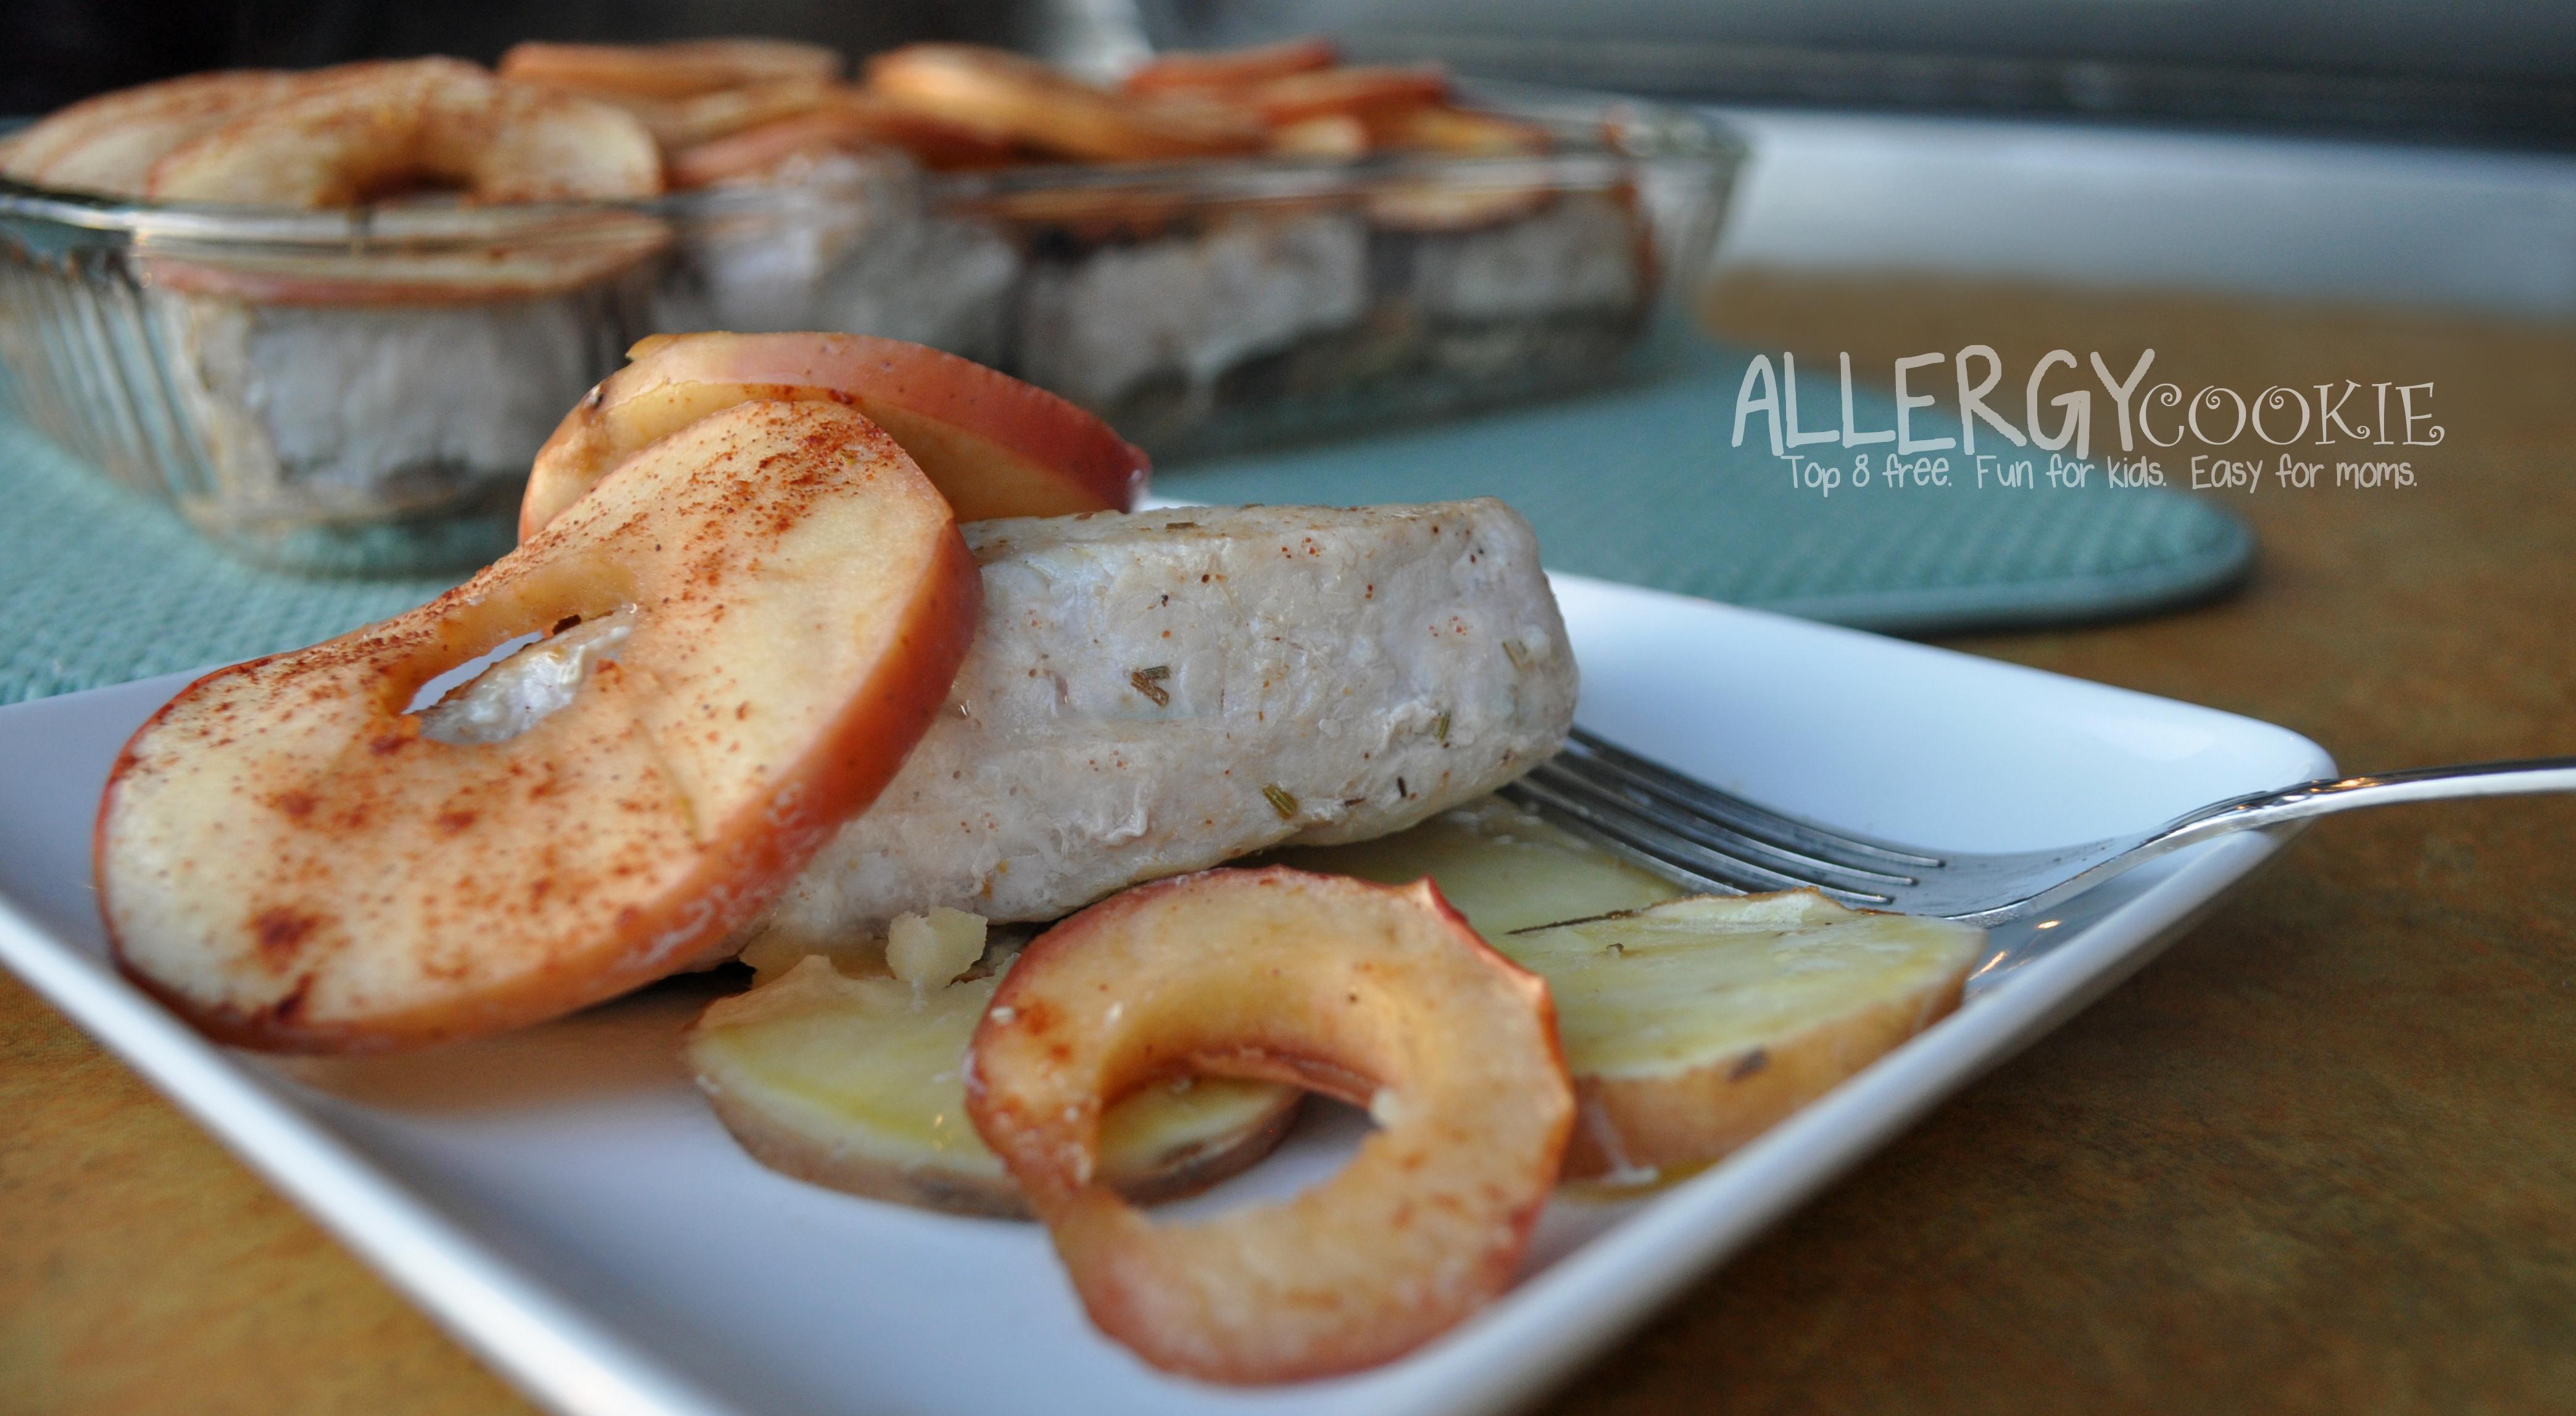 Pork & Sweet Potato Casserole